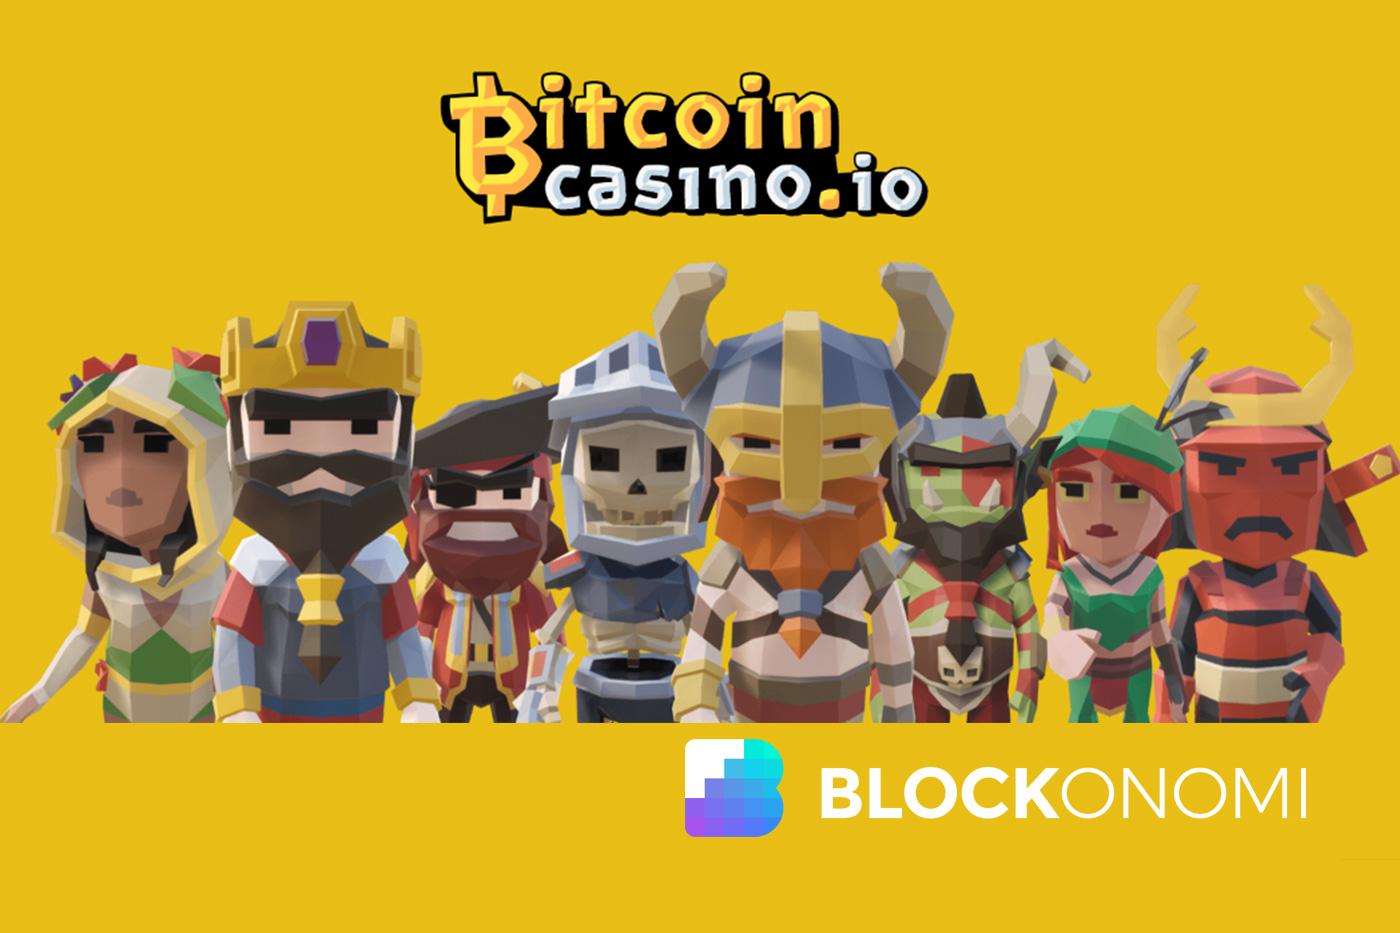 Manteca คาสิโน bitcoin จริง